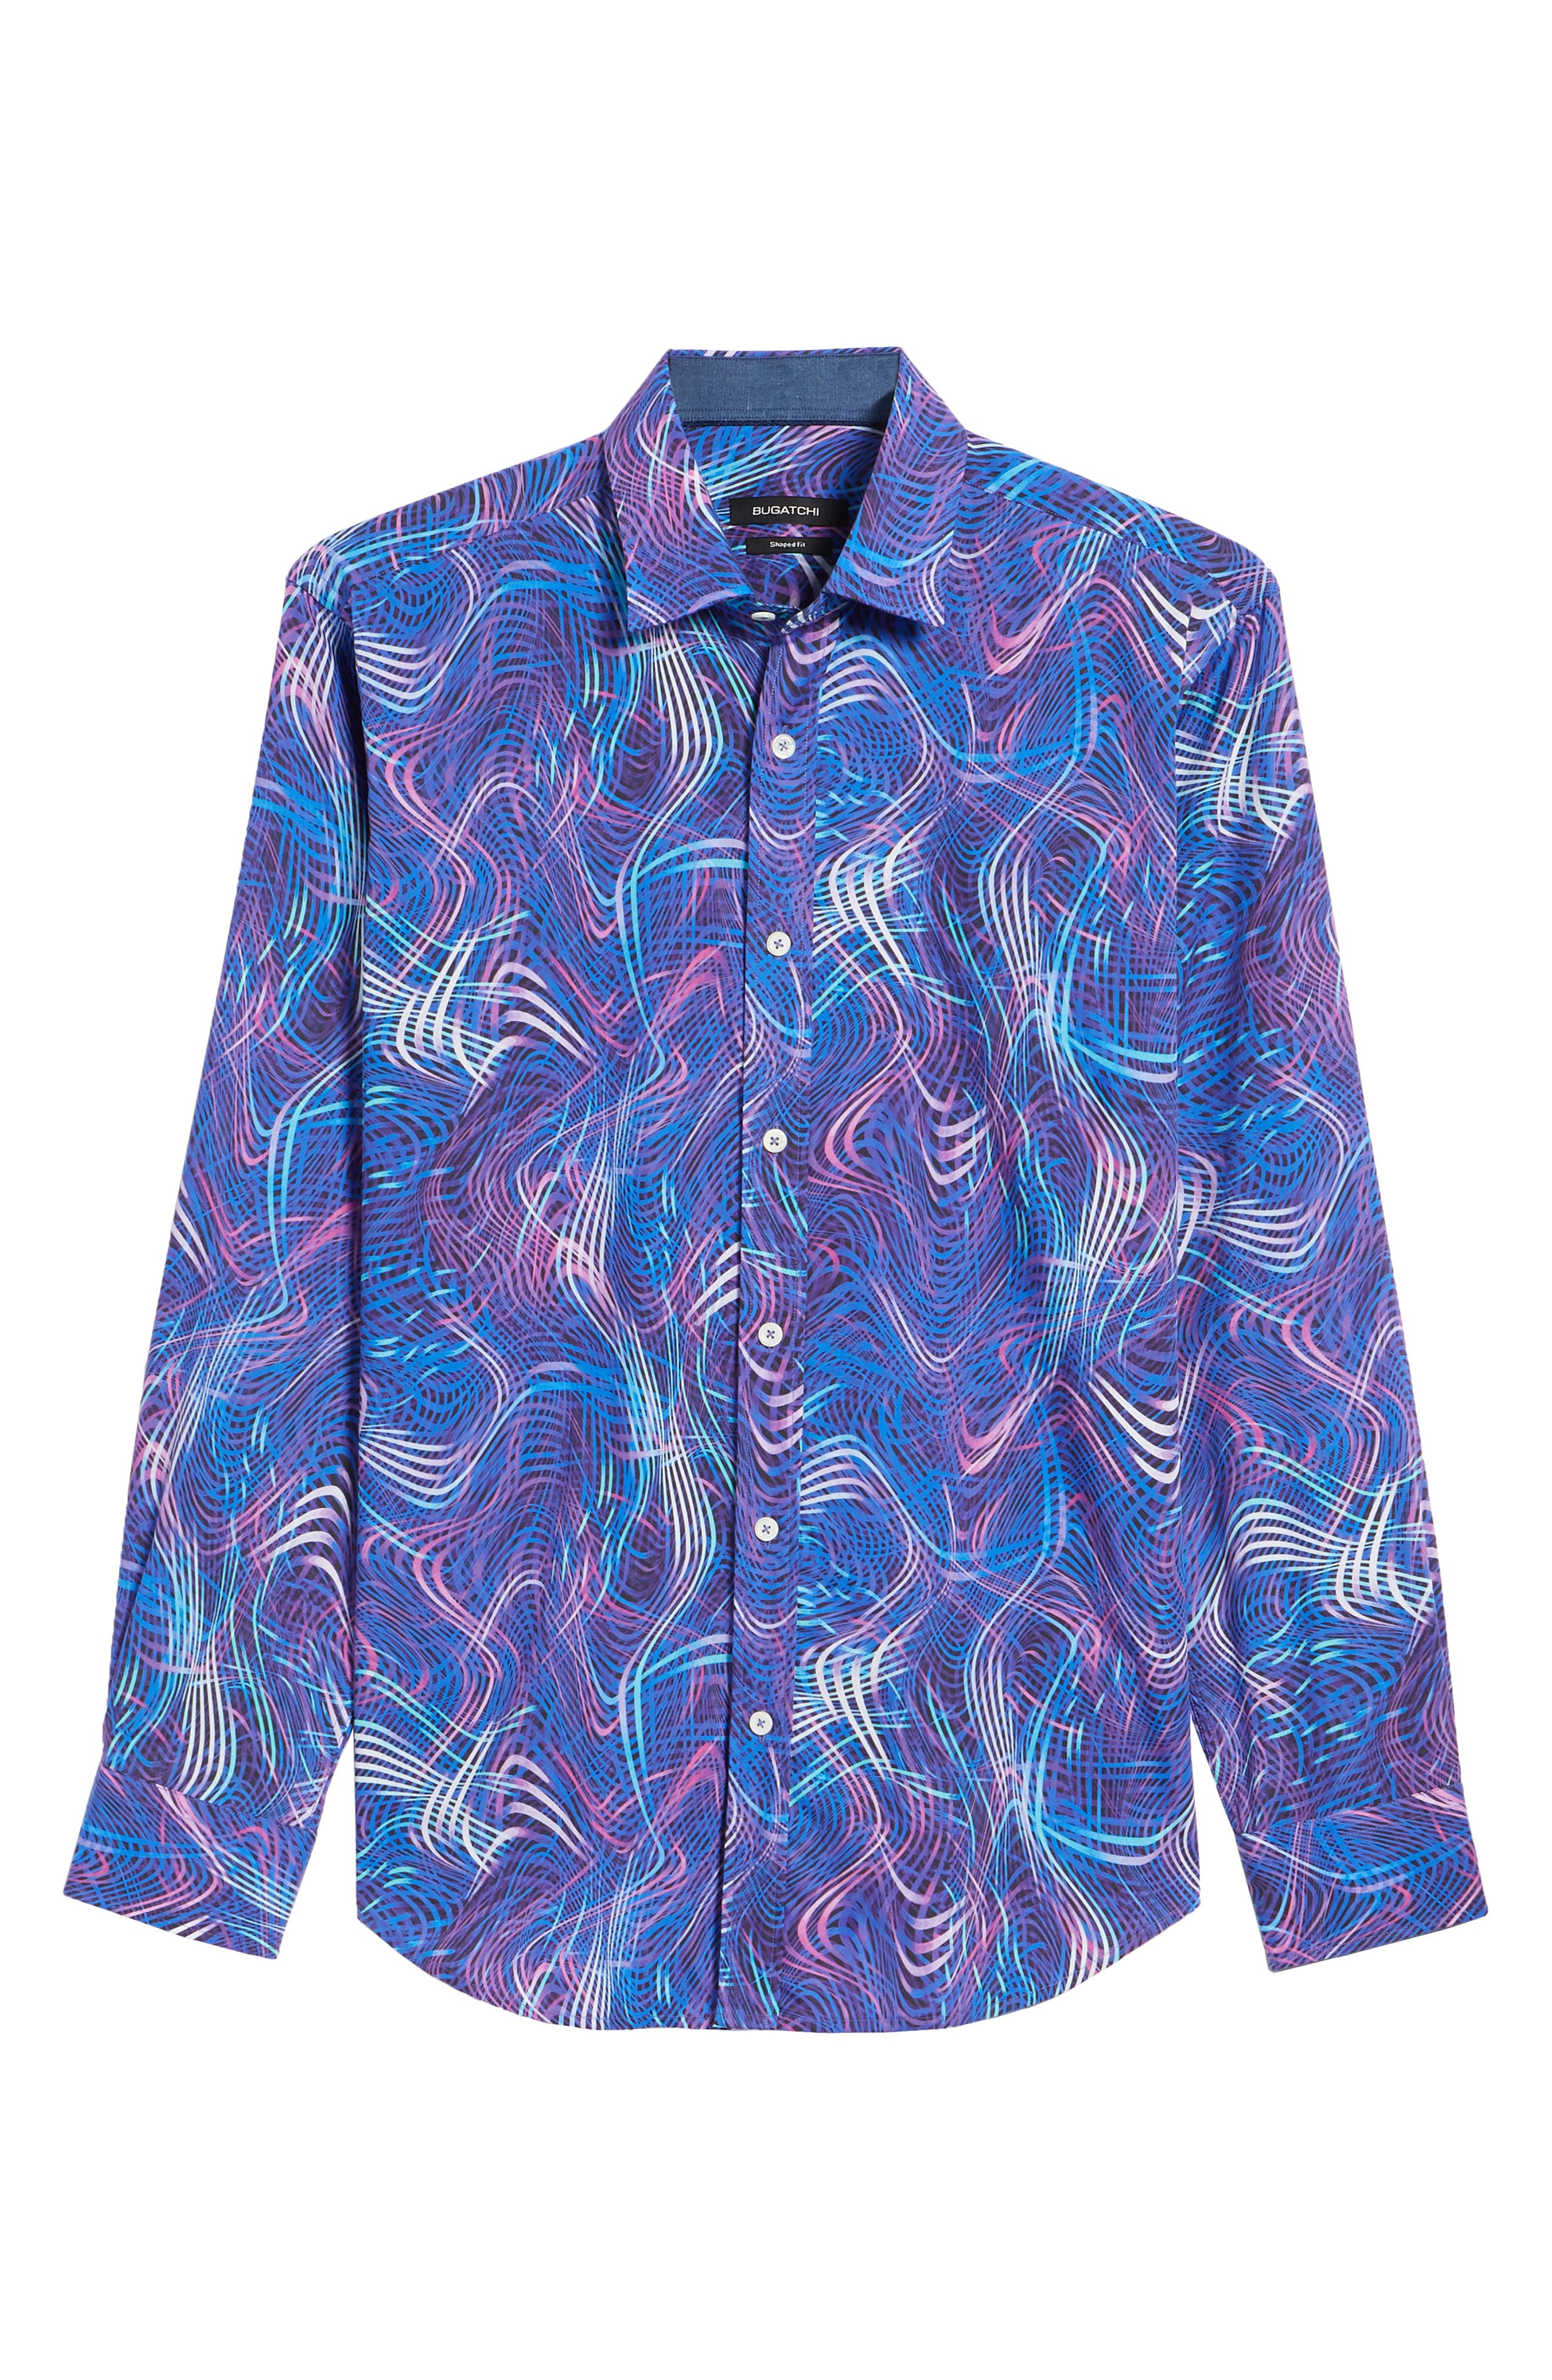 BUGATCHI,                             Woven Sport Shirt,                             Alternate thumbnail 6, color,                             504